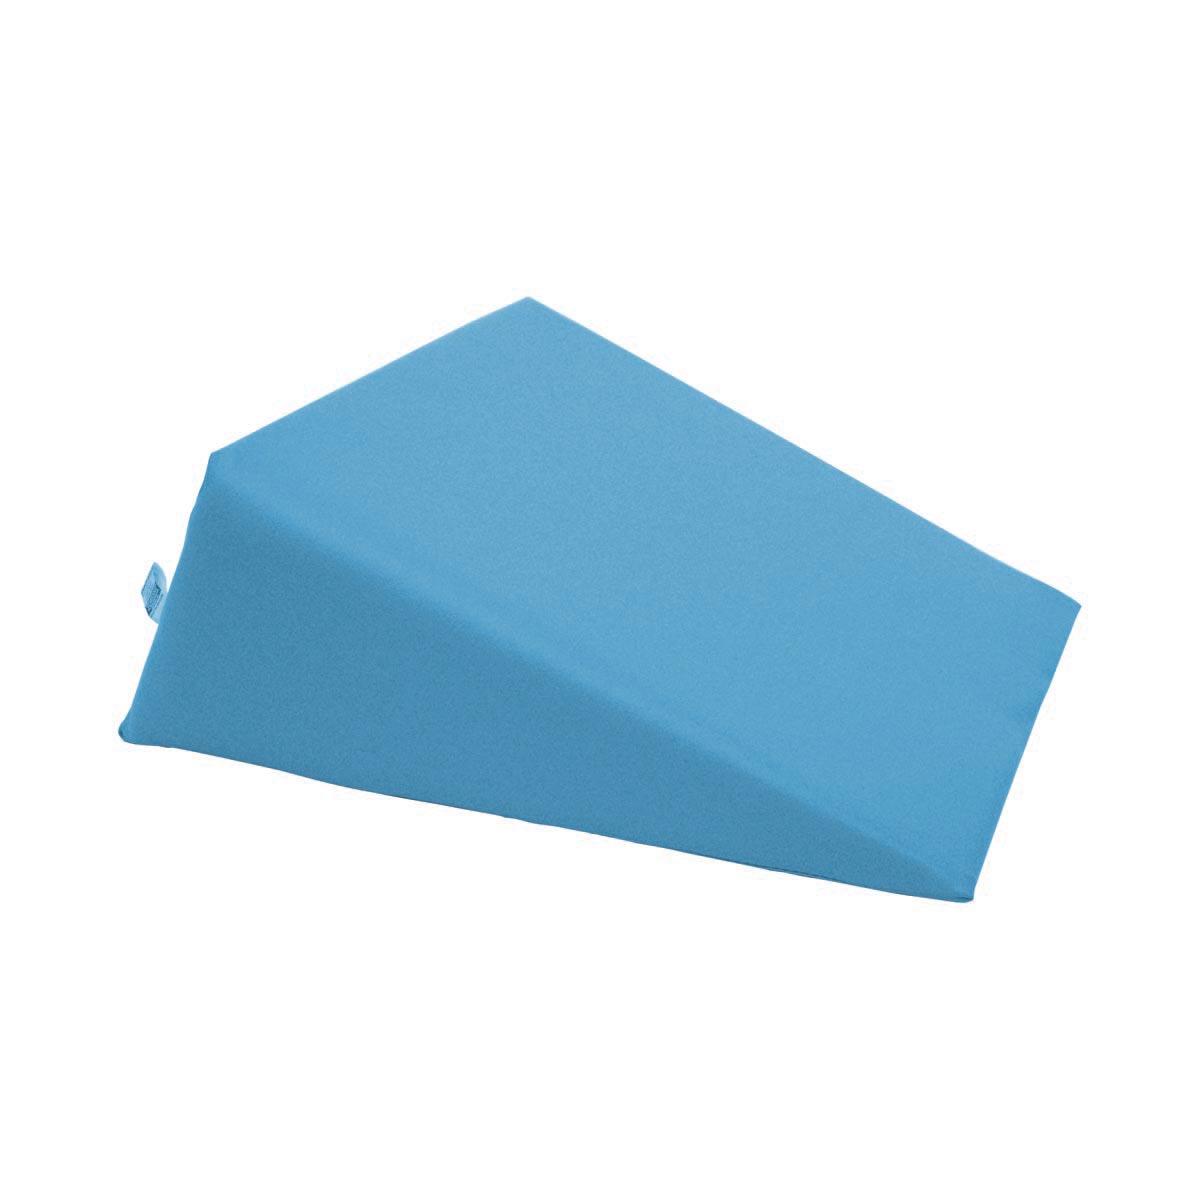 Small Foam Wedge Pillow  Wedge Pillow